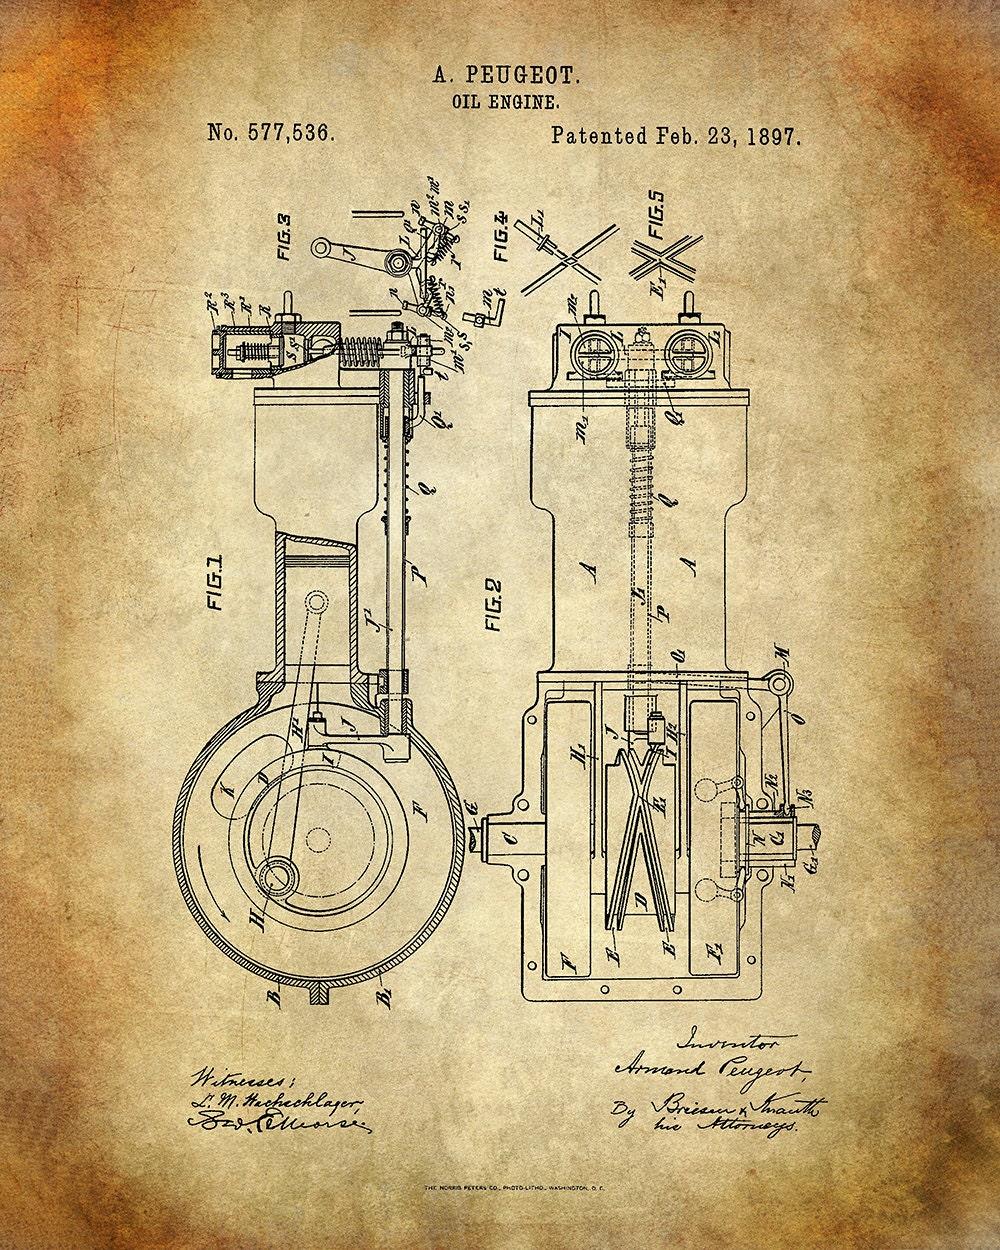 Peugeot Oil Engine Patent Art Print - Four Cycle Engine Patent Print ...